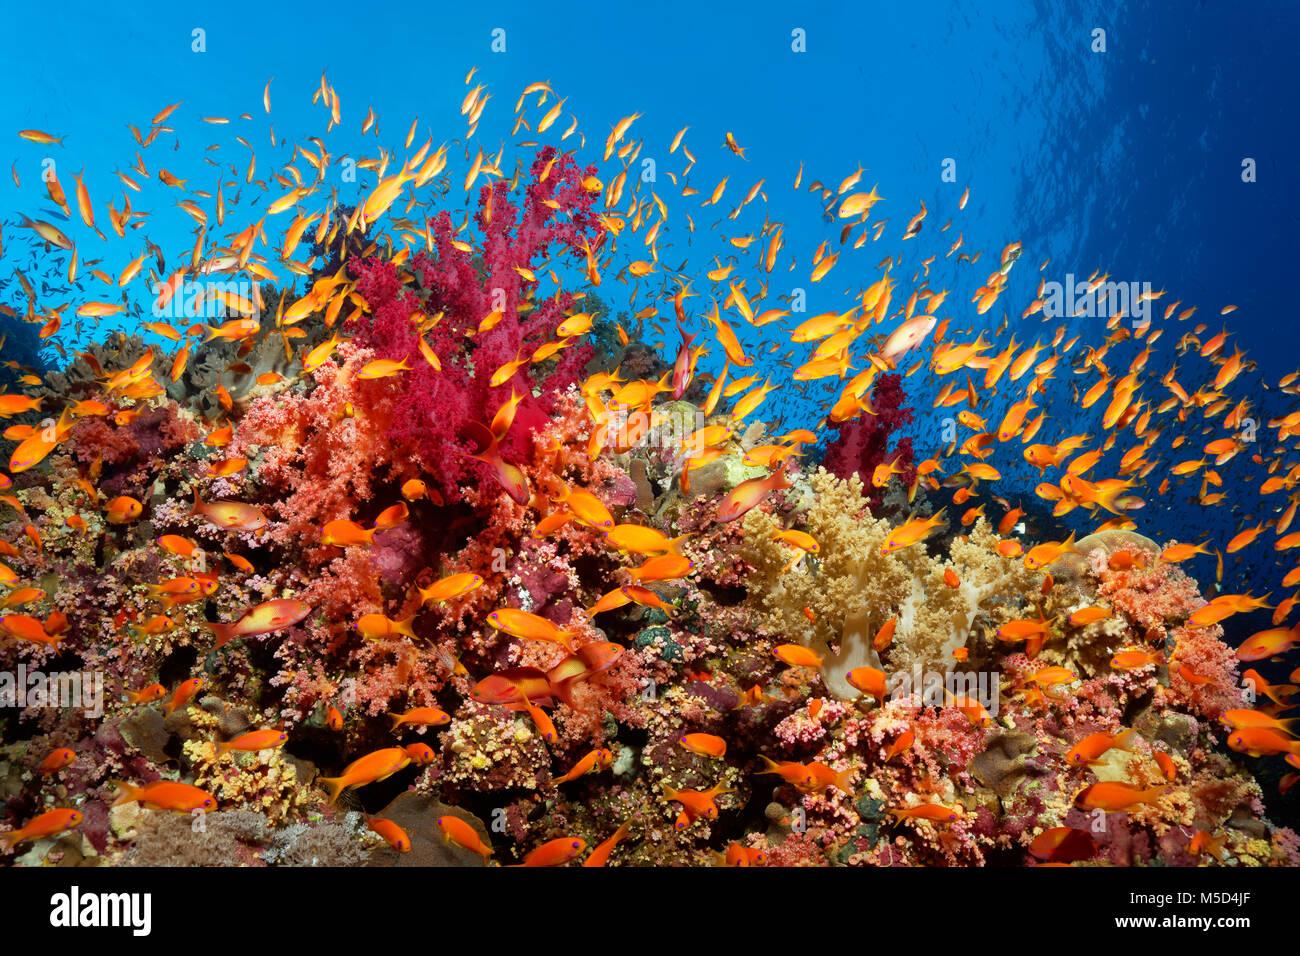 Swarm of Anthias (Anthiinae) swimming close to coral reef, Red Sea, Egypt - Stock Image